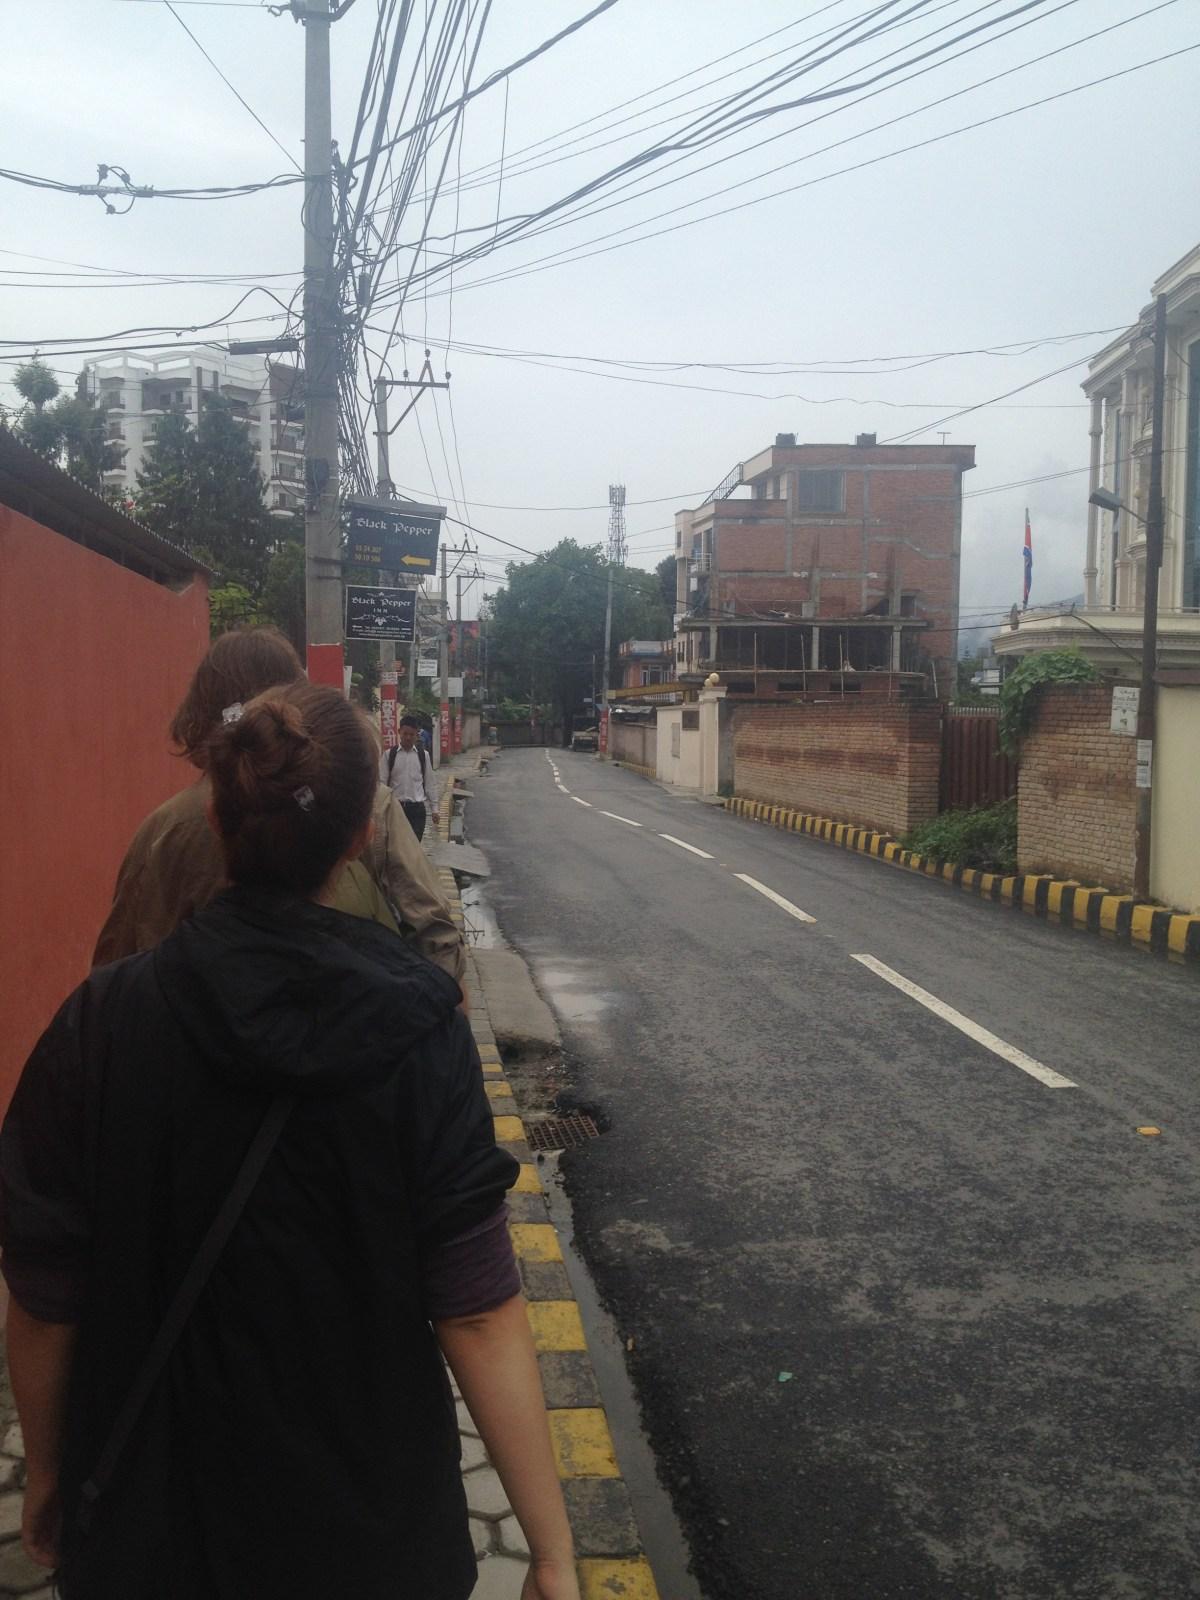 Kathmandu Tourism: Walking Near Freak Street and Durbar Square